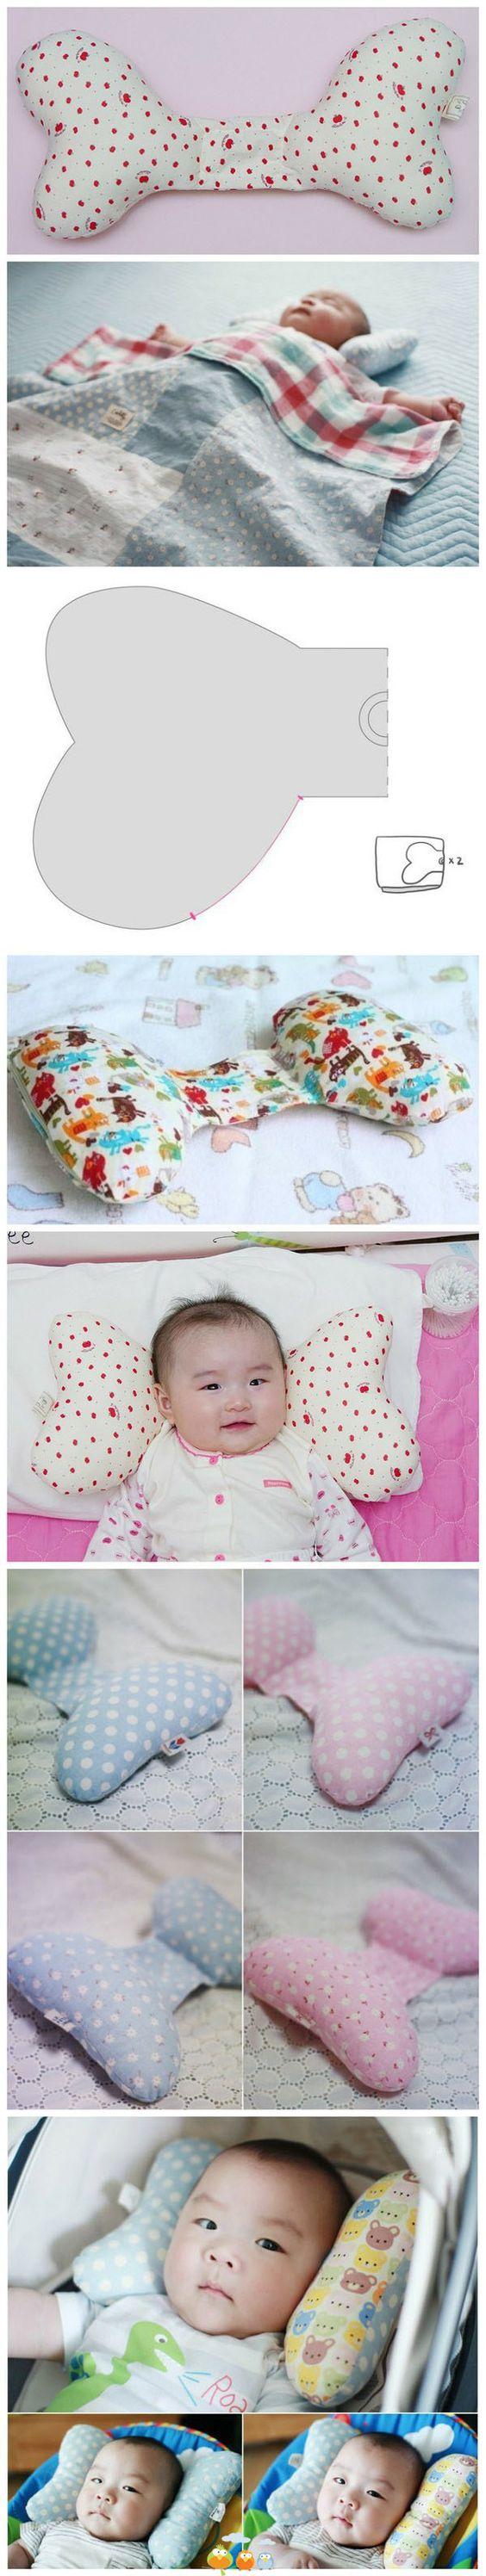 как сшить подушку для младенца